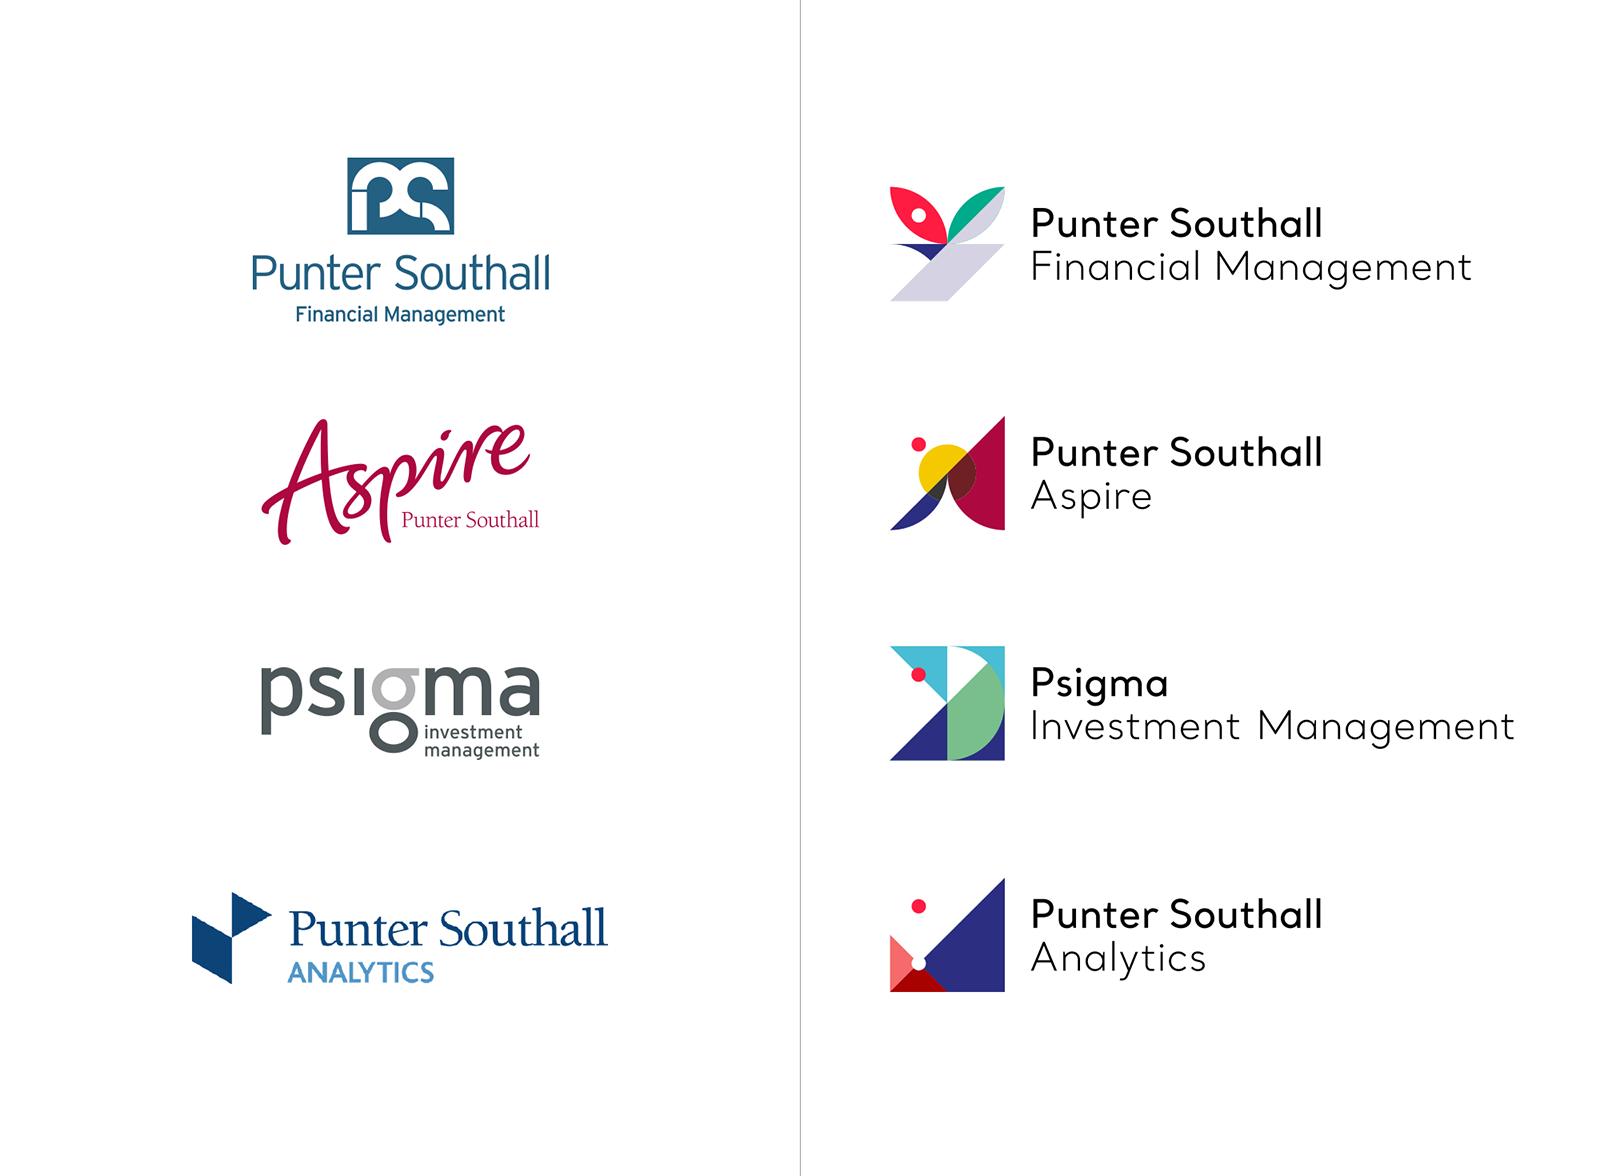 Punter Southall Group集团品牌VI视觉形象设计欣赏-深圳VI设计3